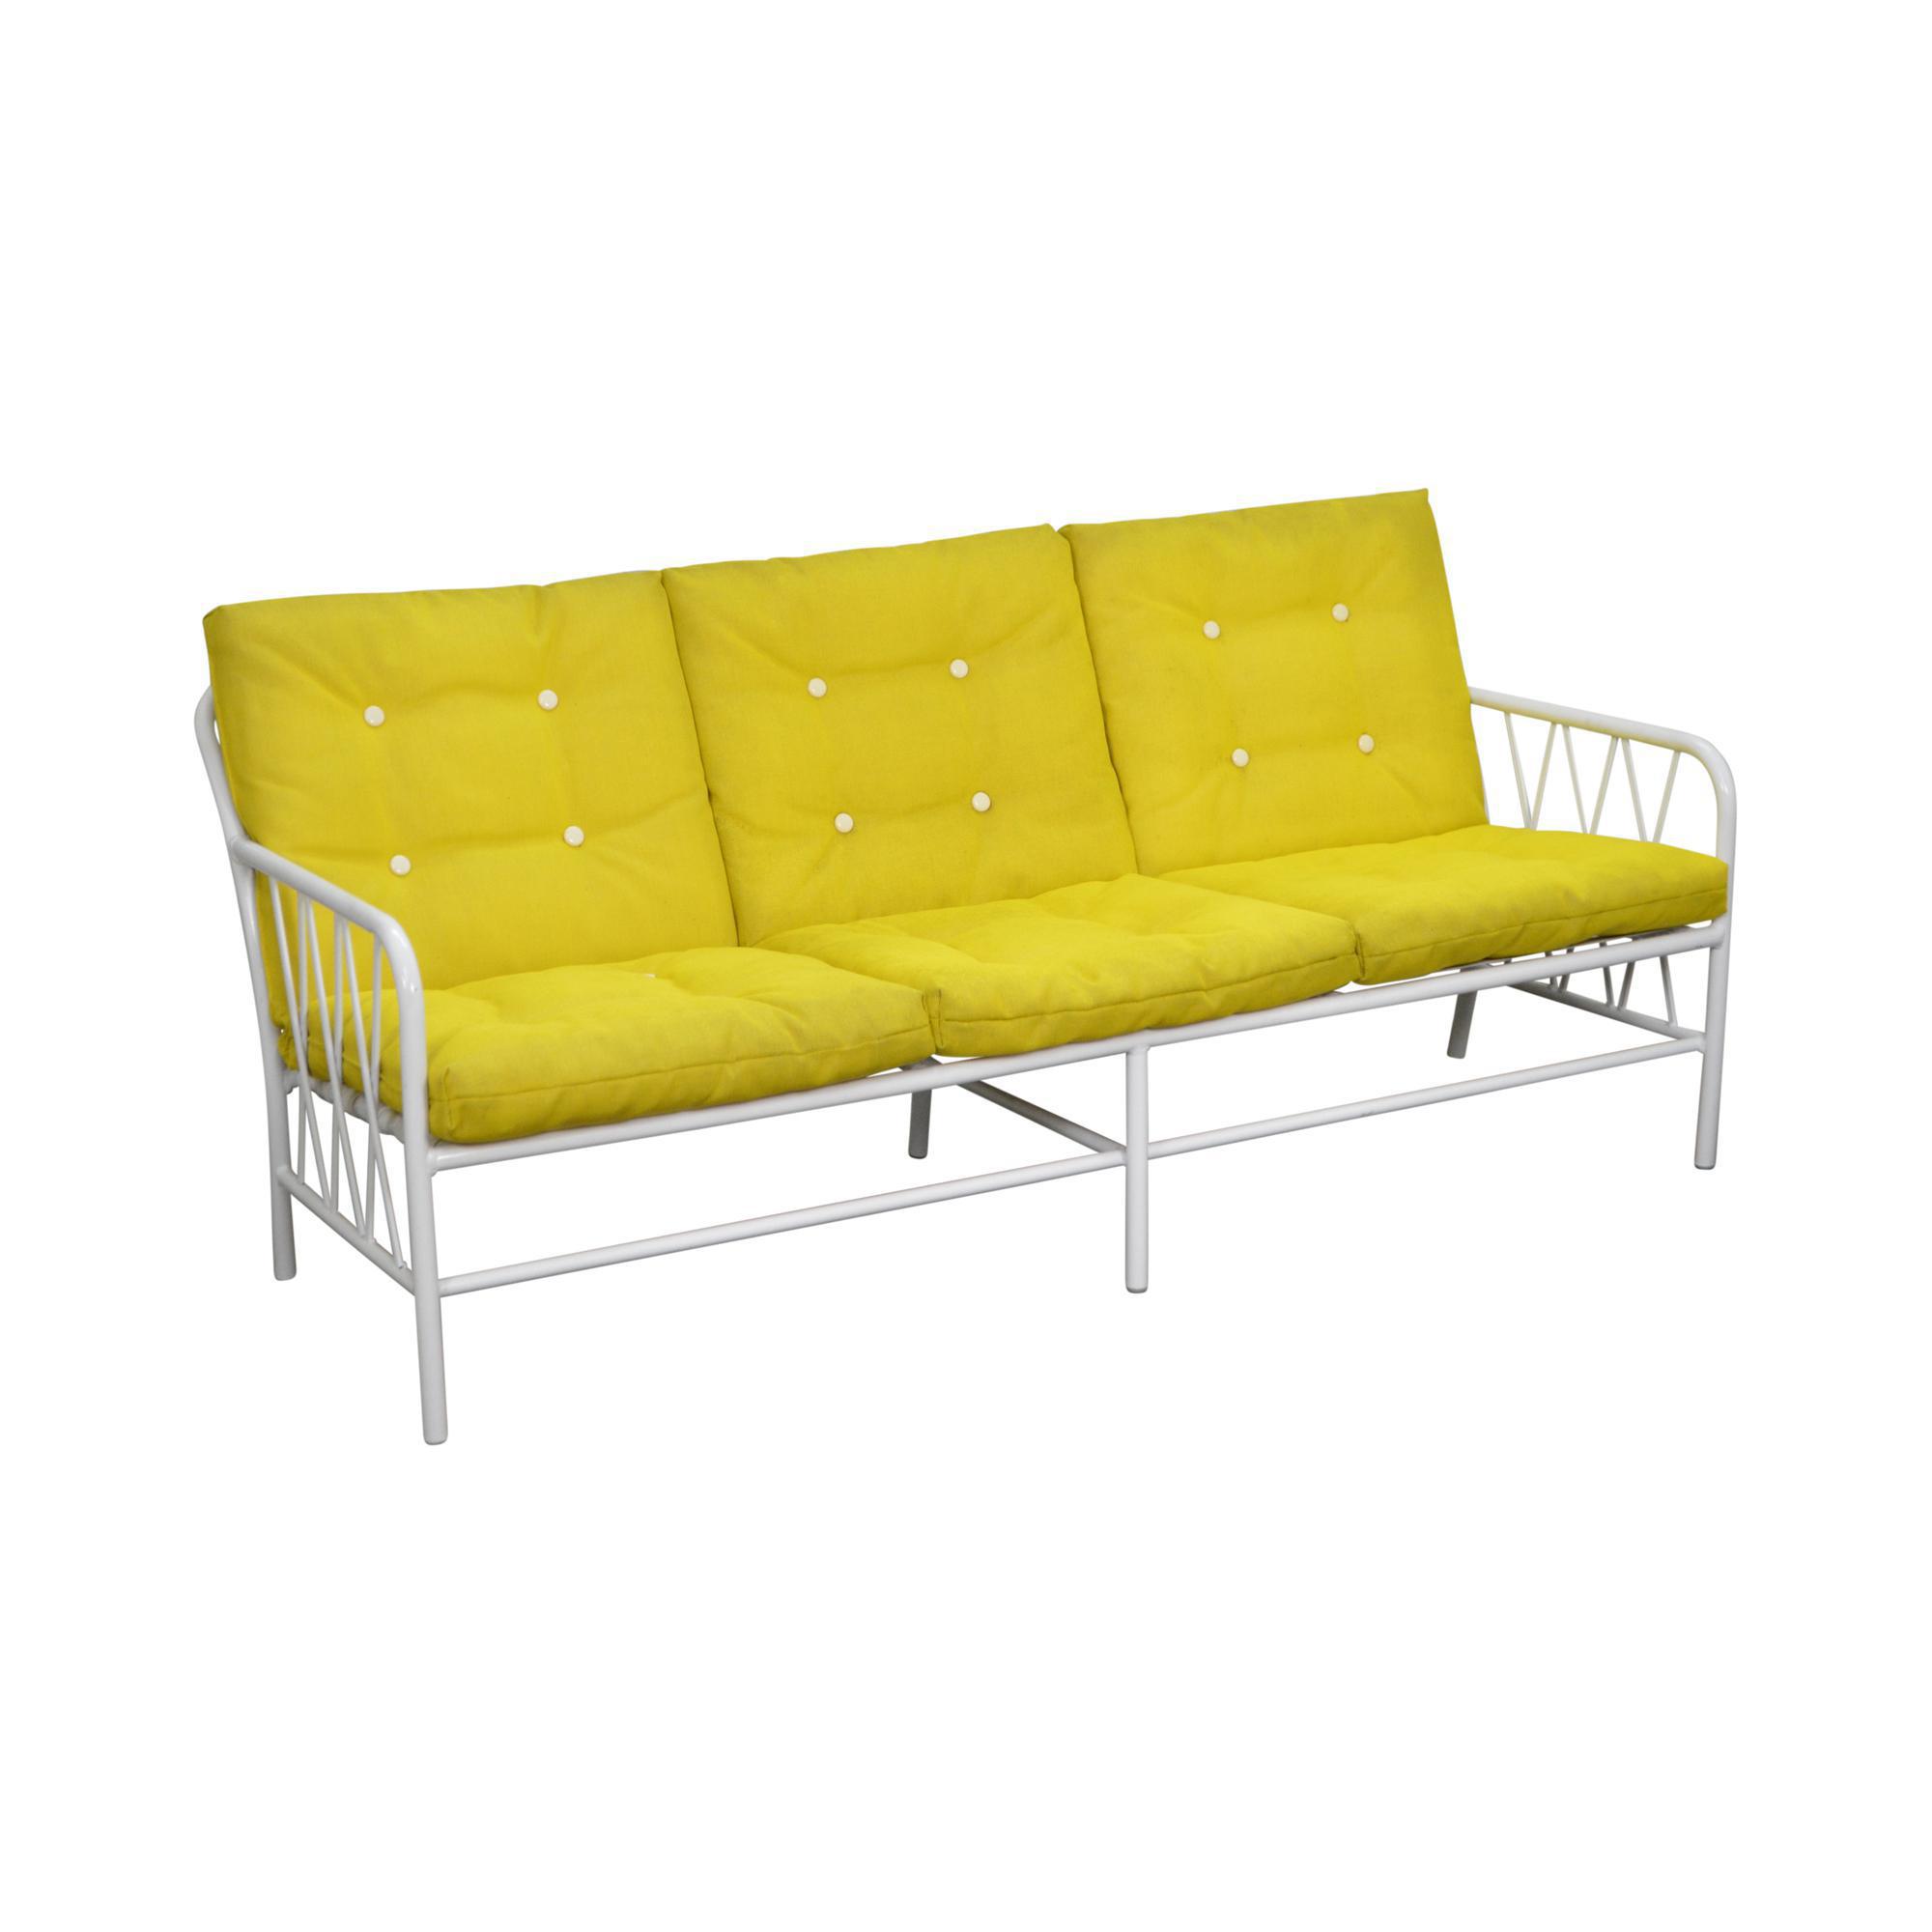 Mid Century Modern Brown Jordan Style White Patio Sofa W/ Yellow Cushions